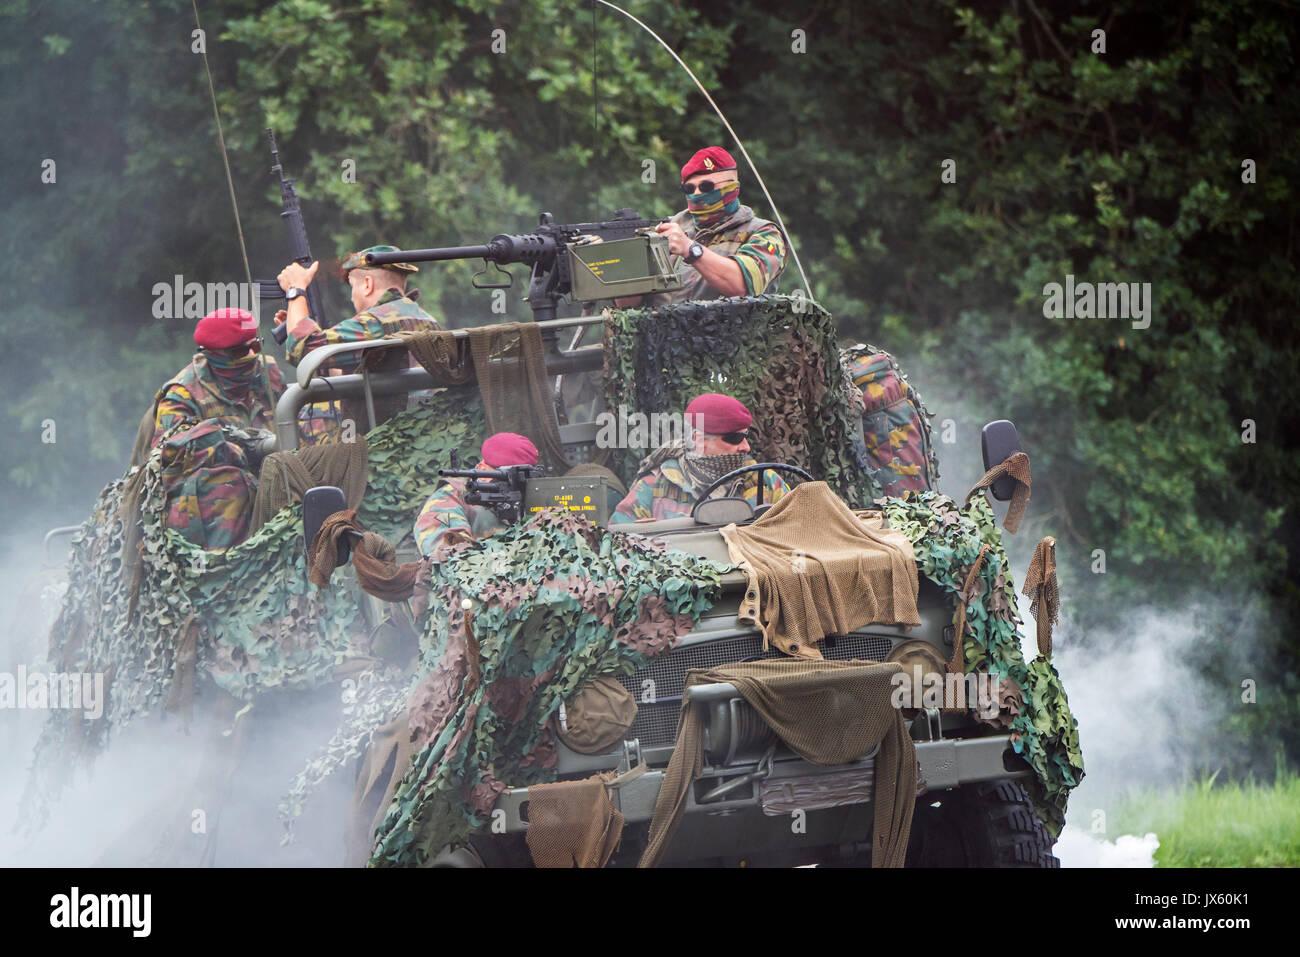 belgian-paracommandos-of-the-para-commando-regiment-under-attack-in-JX60K1.jpg